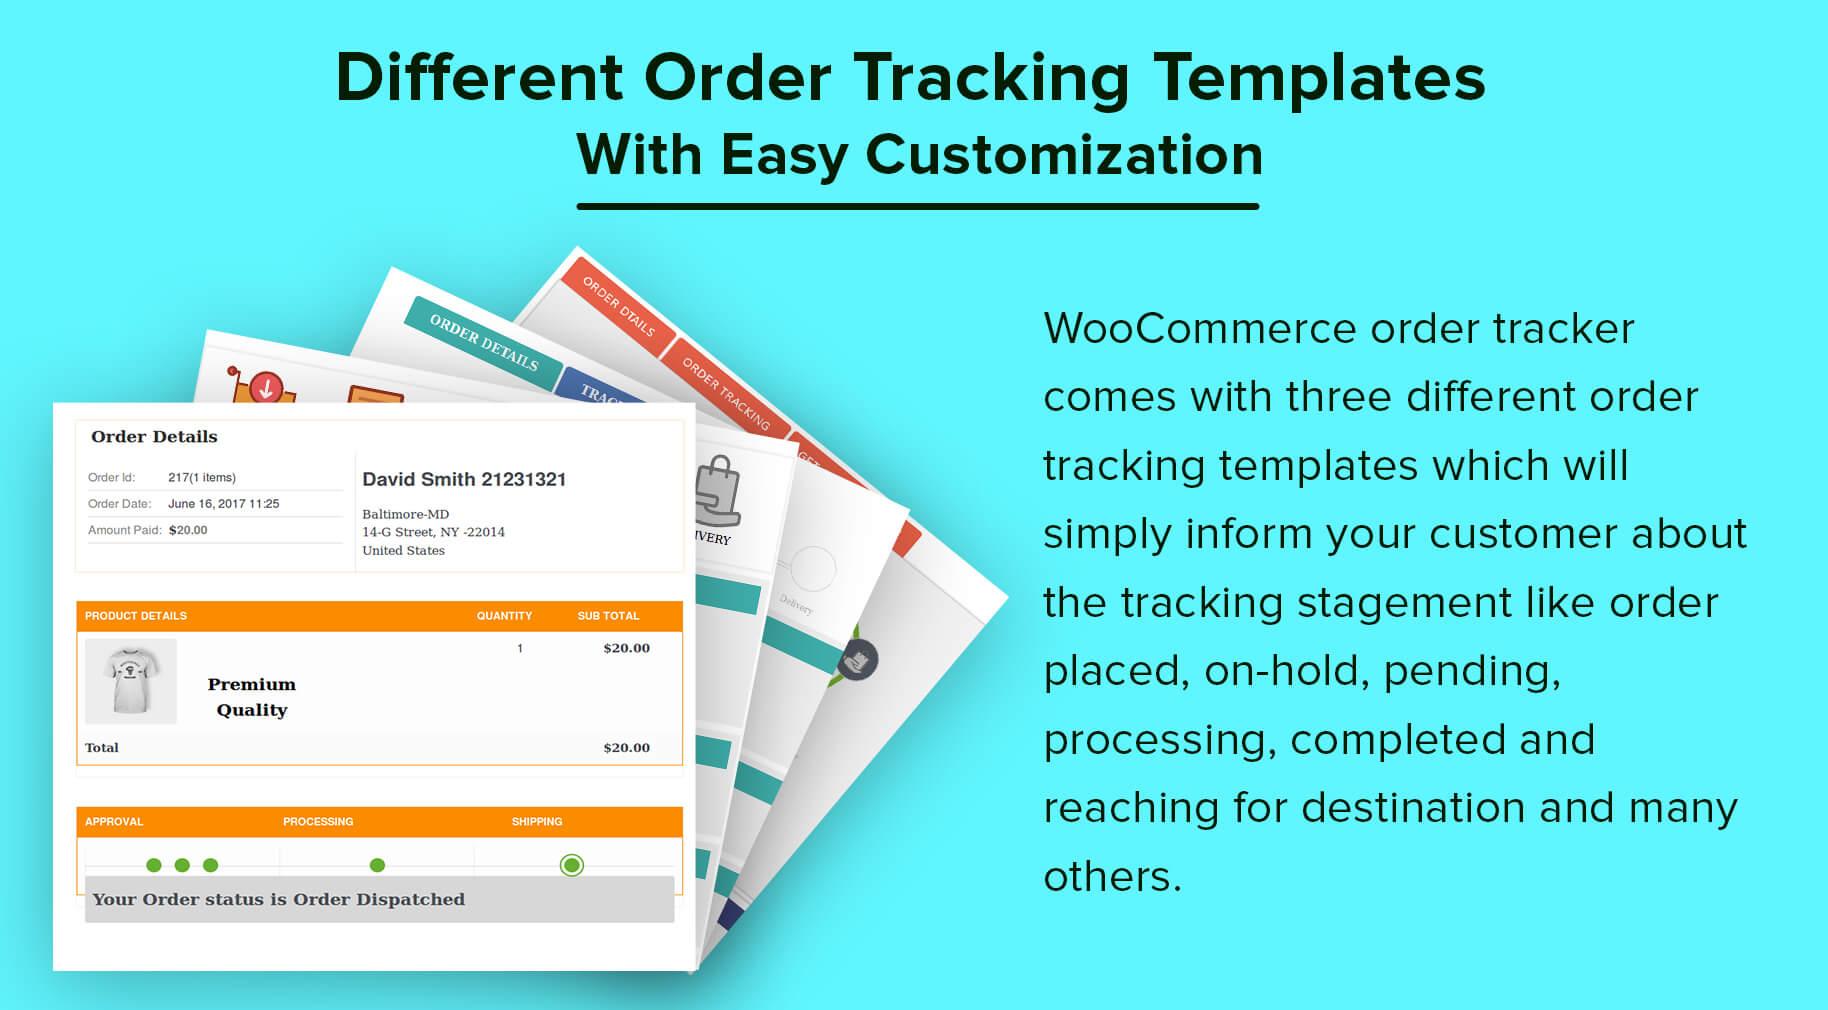 WooCommerce Order Tracker - 5